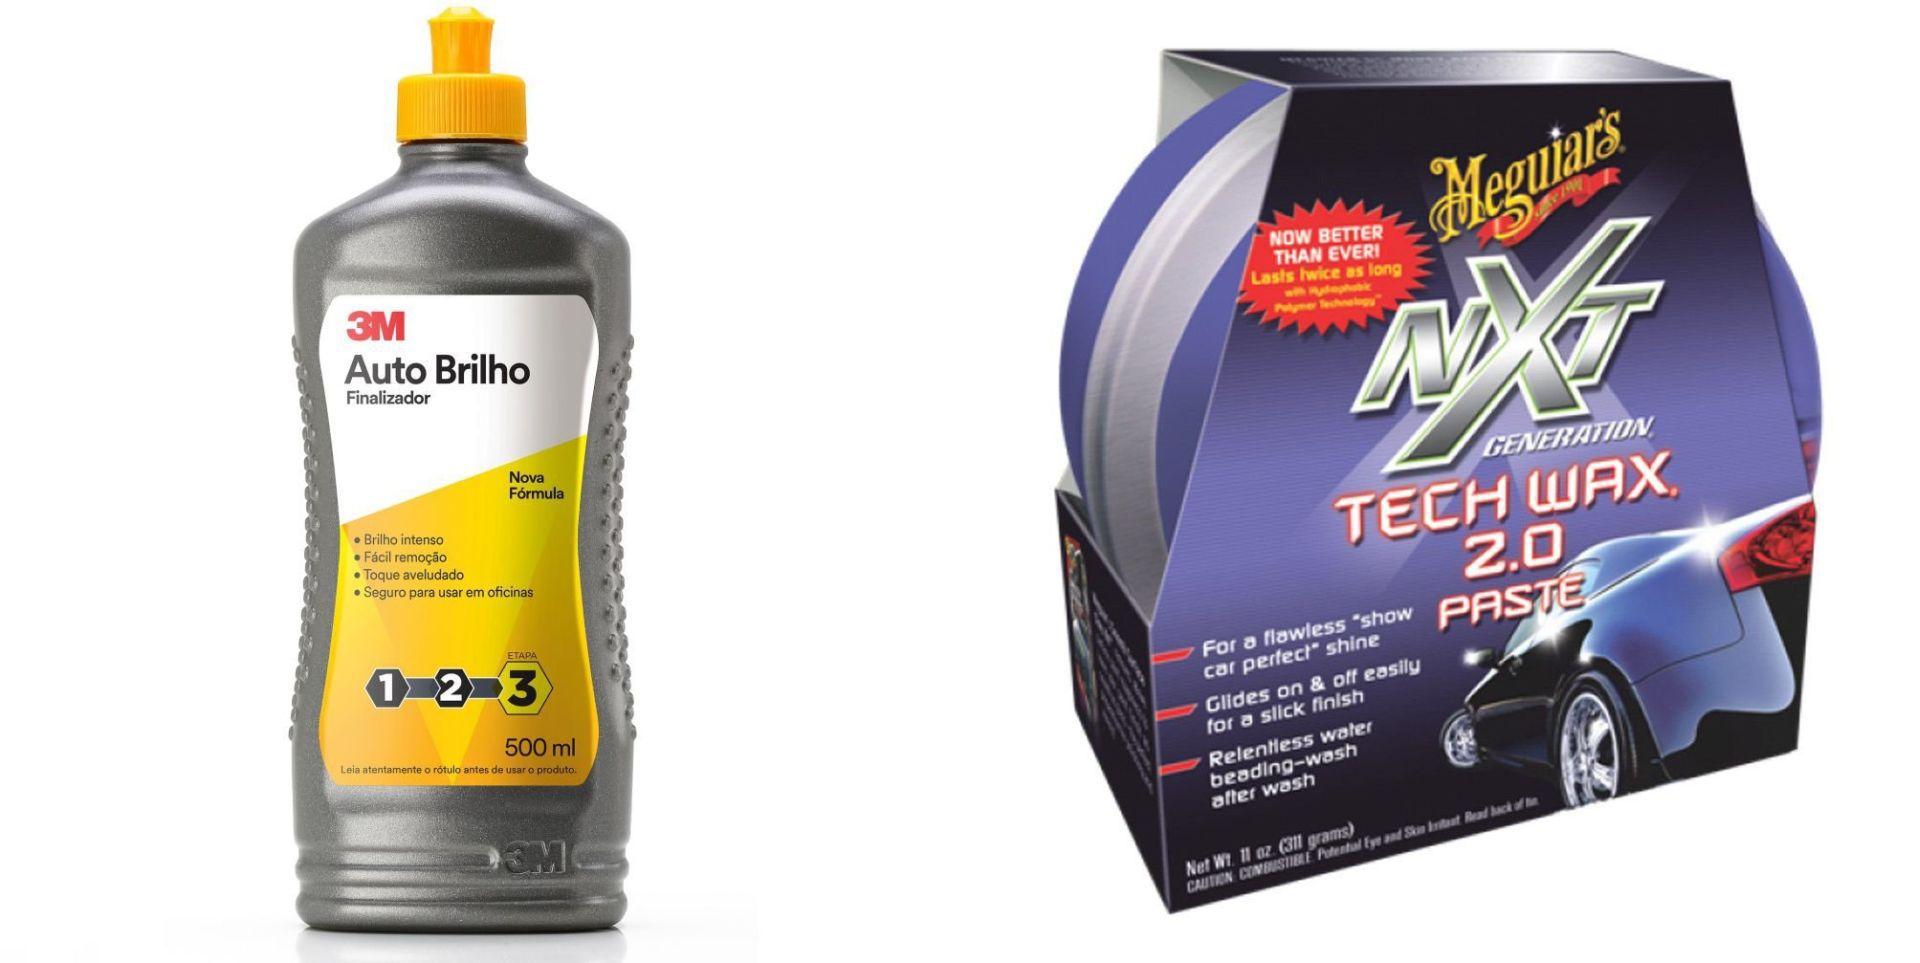 Kit Cera Nxt Generation Tech Wax+Lustrador Auto Brilho